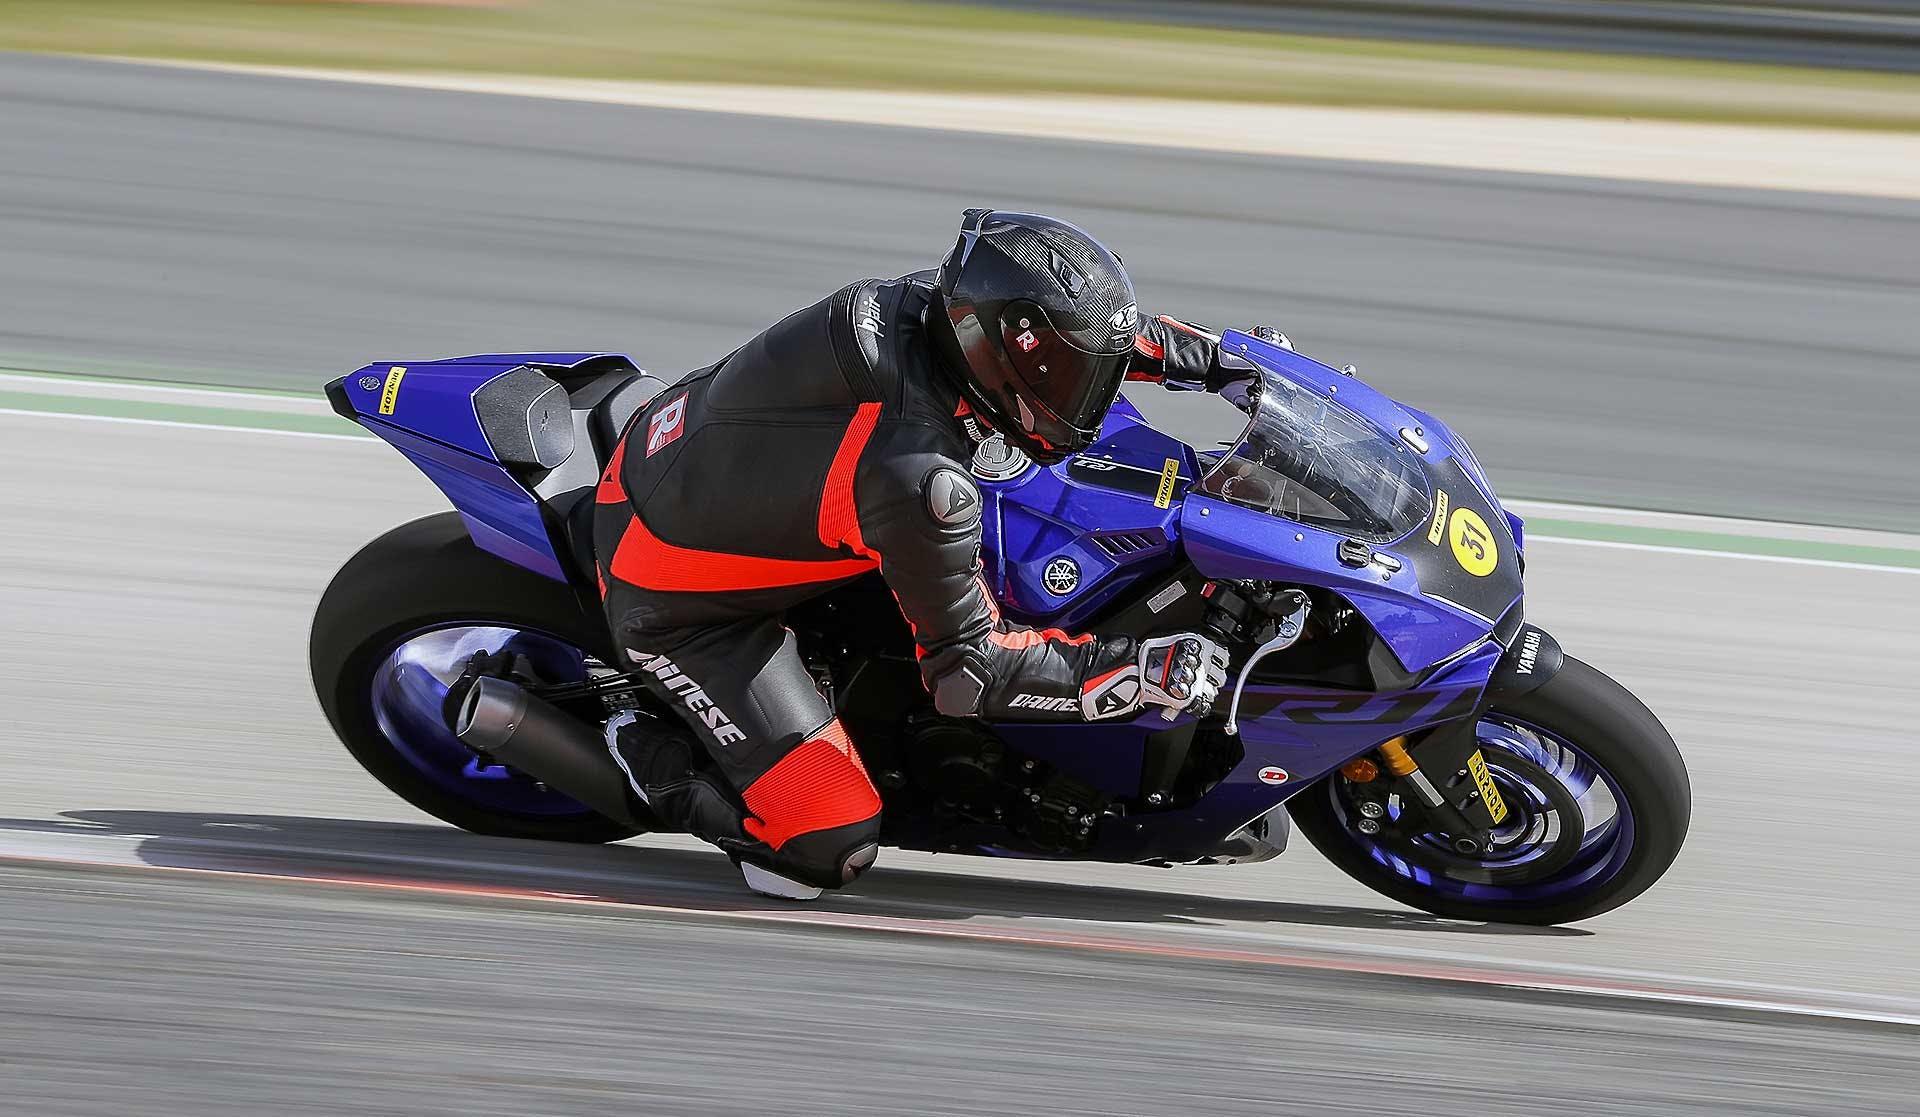 Dunlop SportSmart TT In pista con Yamaha R1 Blu, piega a sinistra